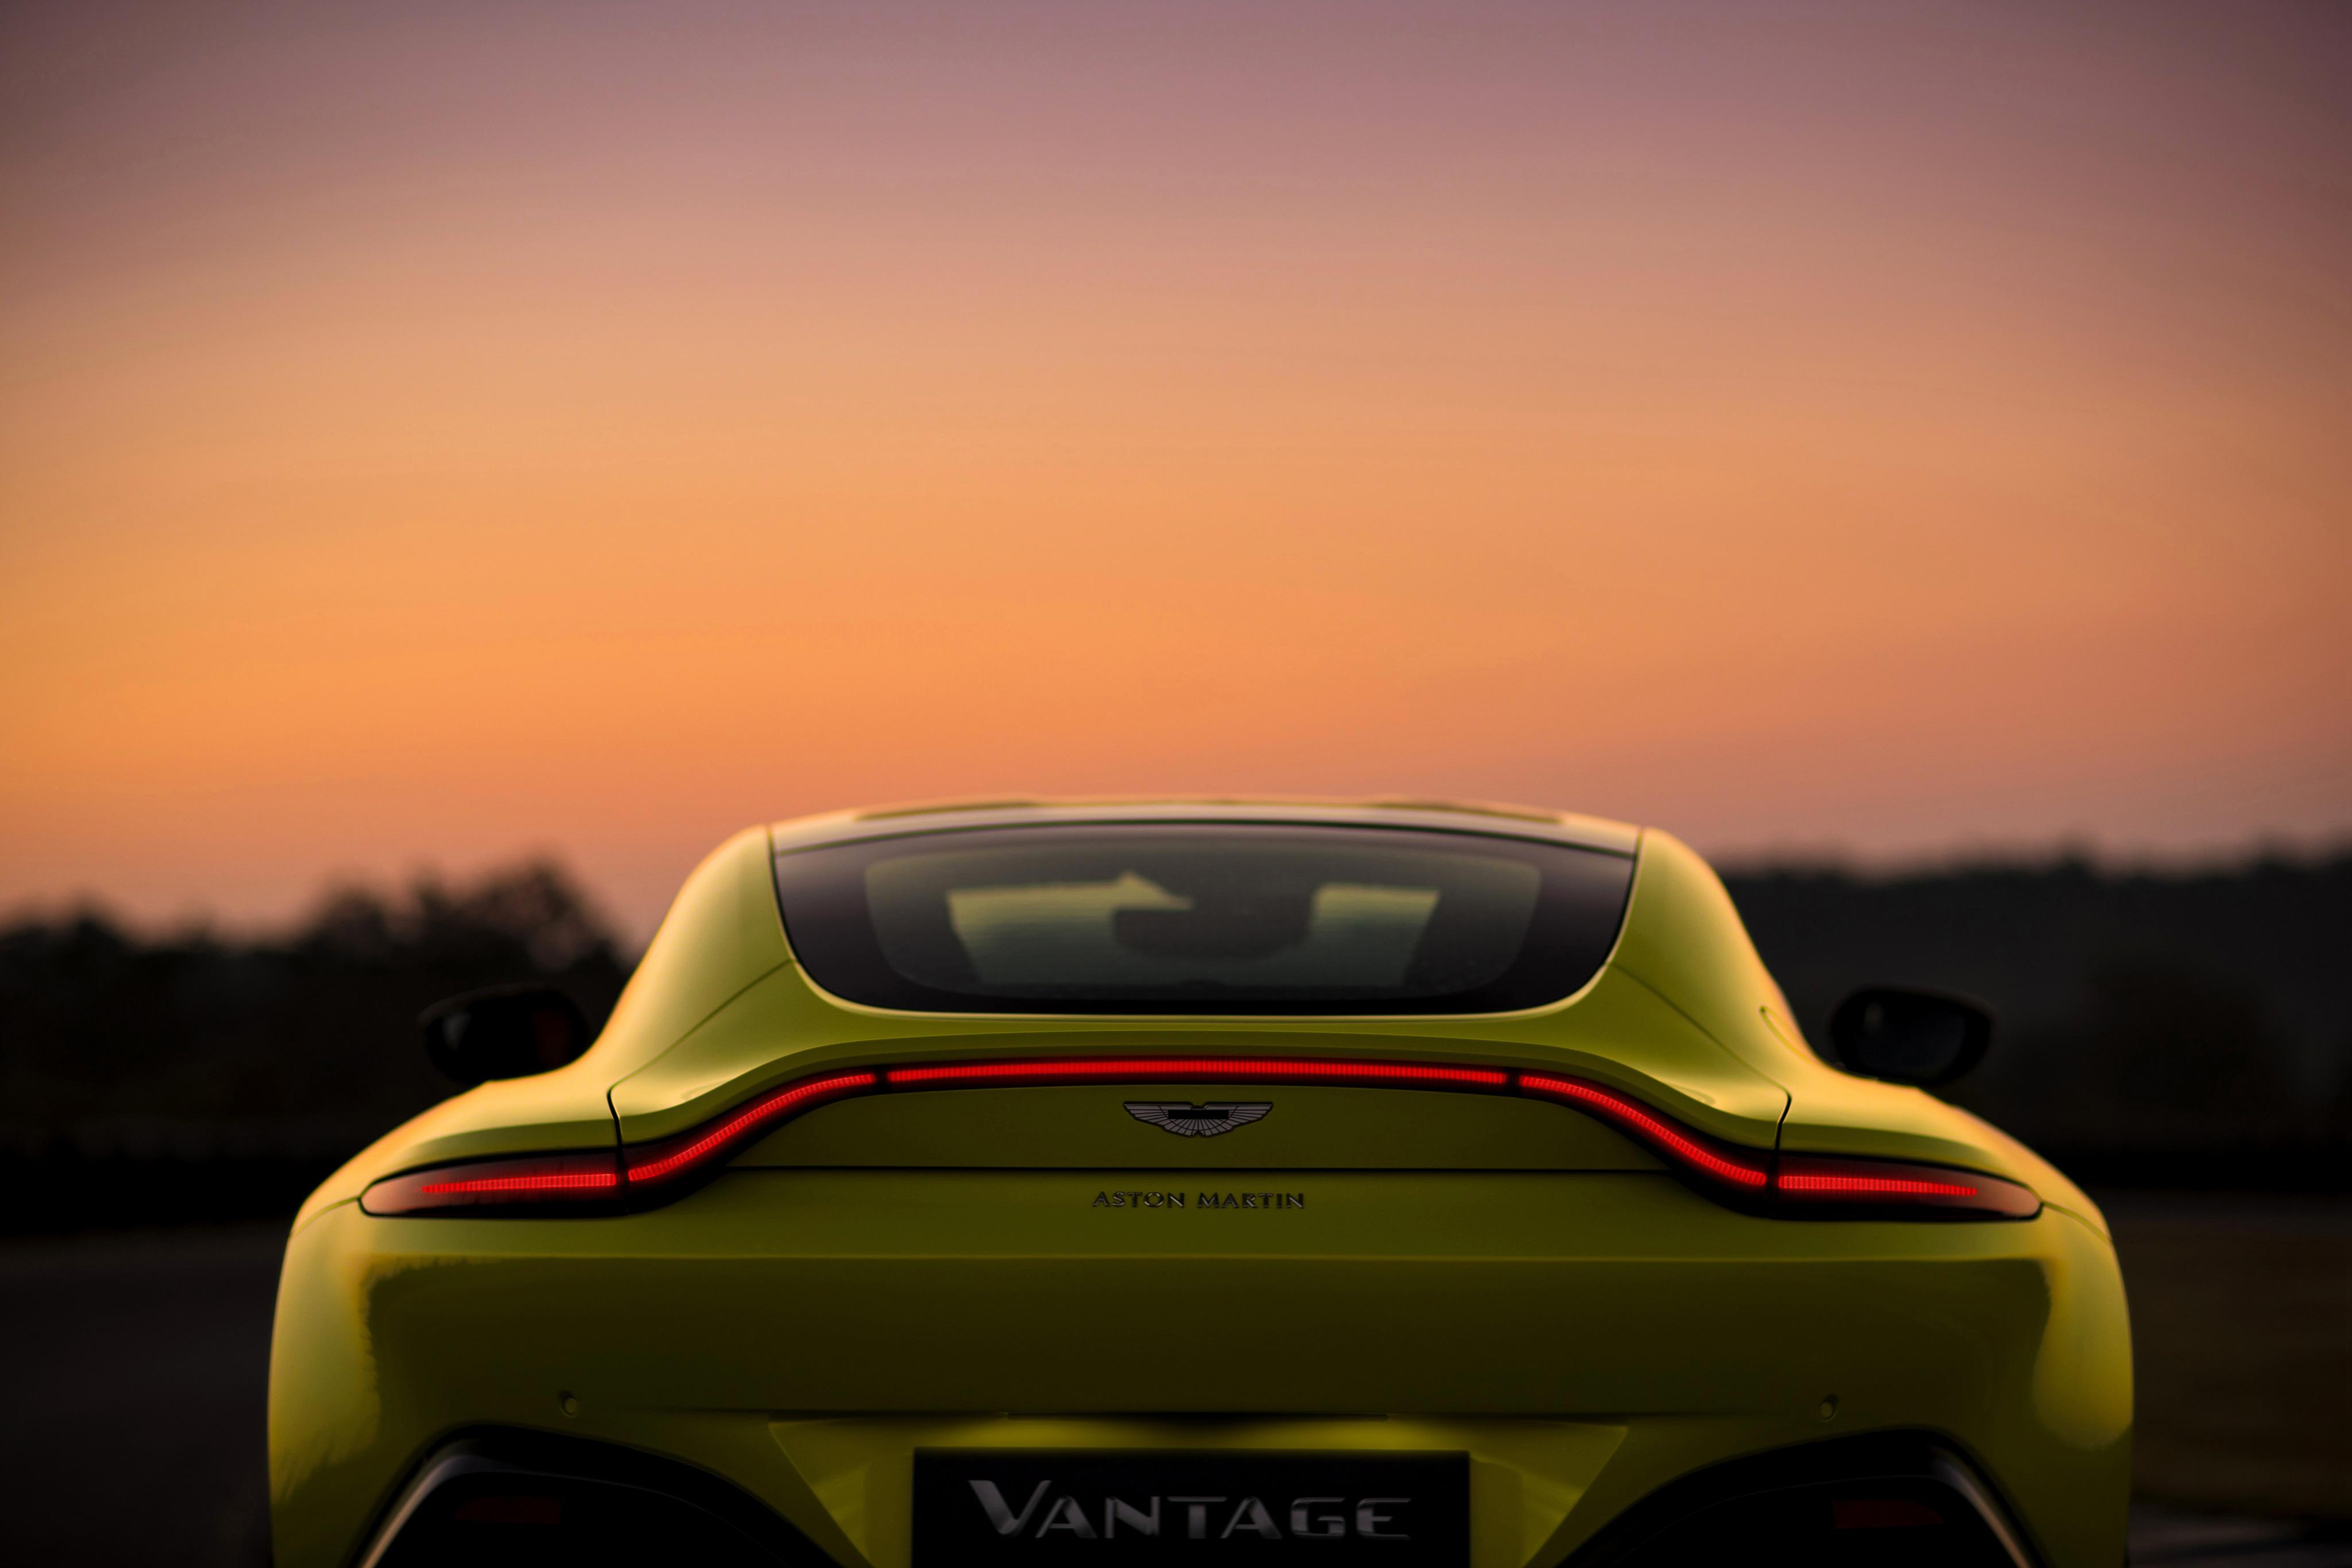 aston martin vantage 2018 4k, hd cars, 4k wallpapers, images